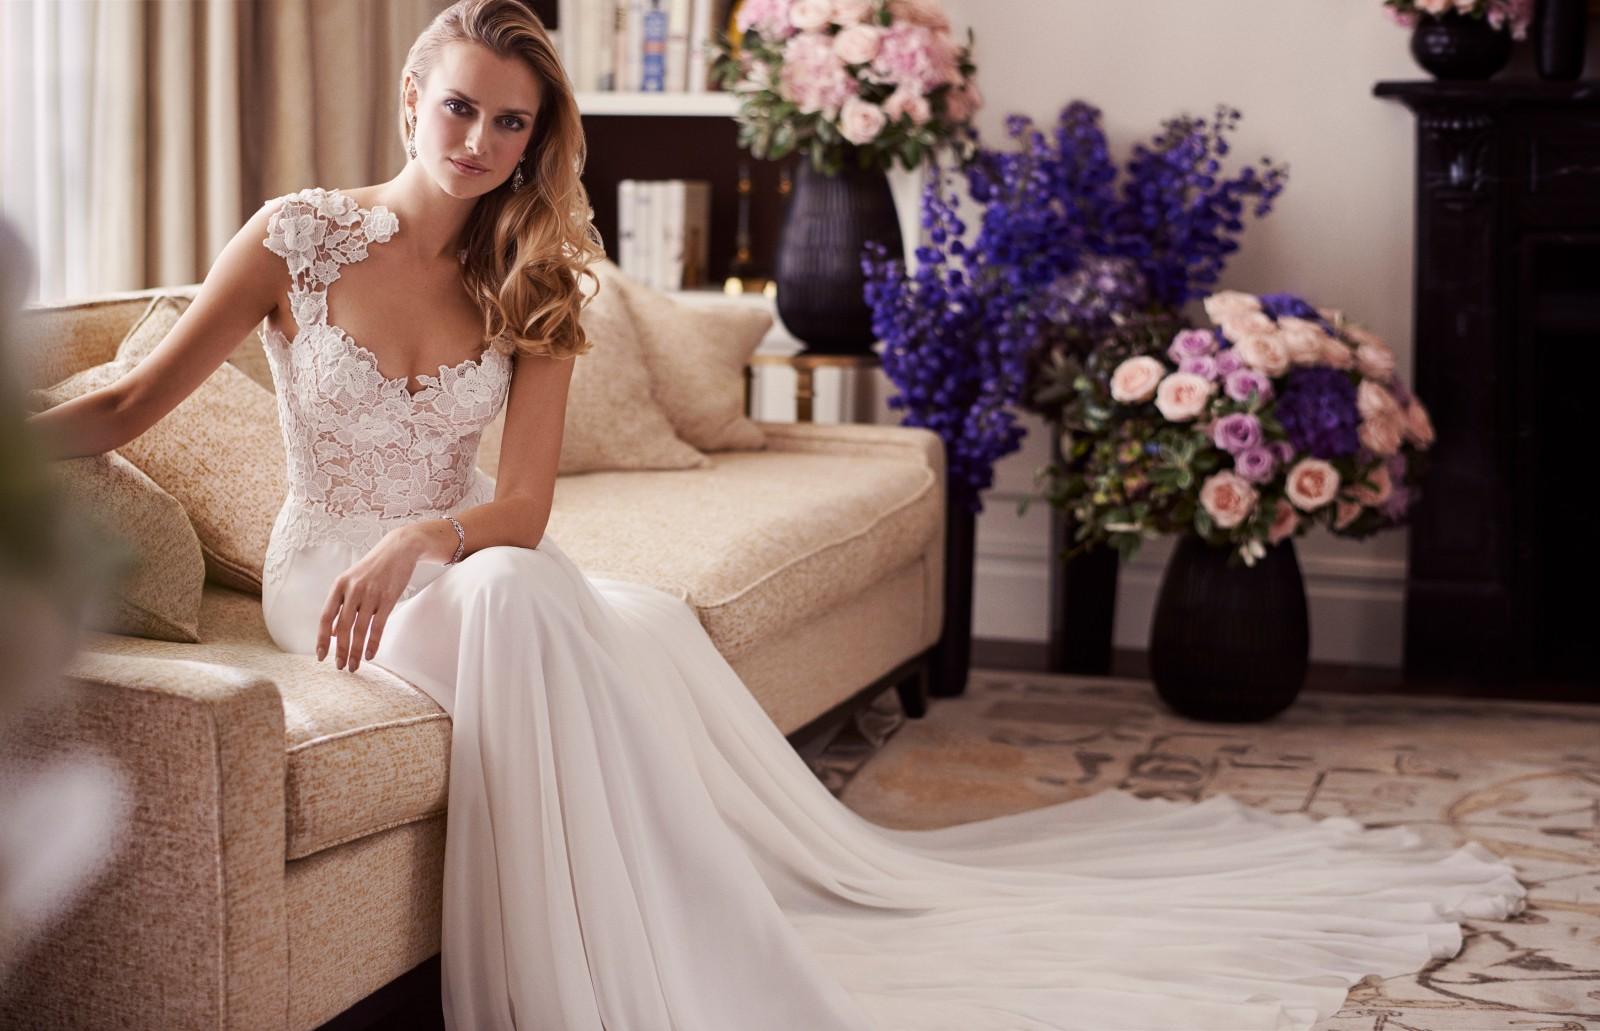 Morning Wedding Dress Caroline Castigliano